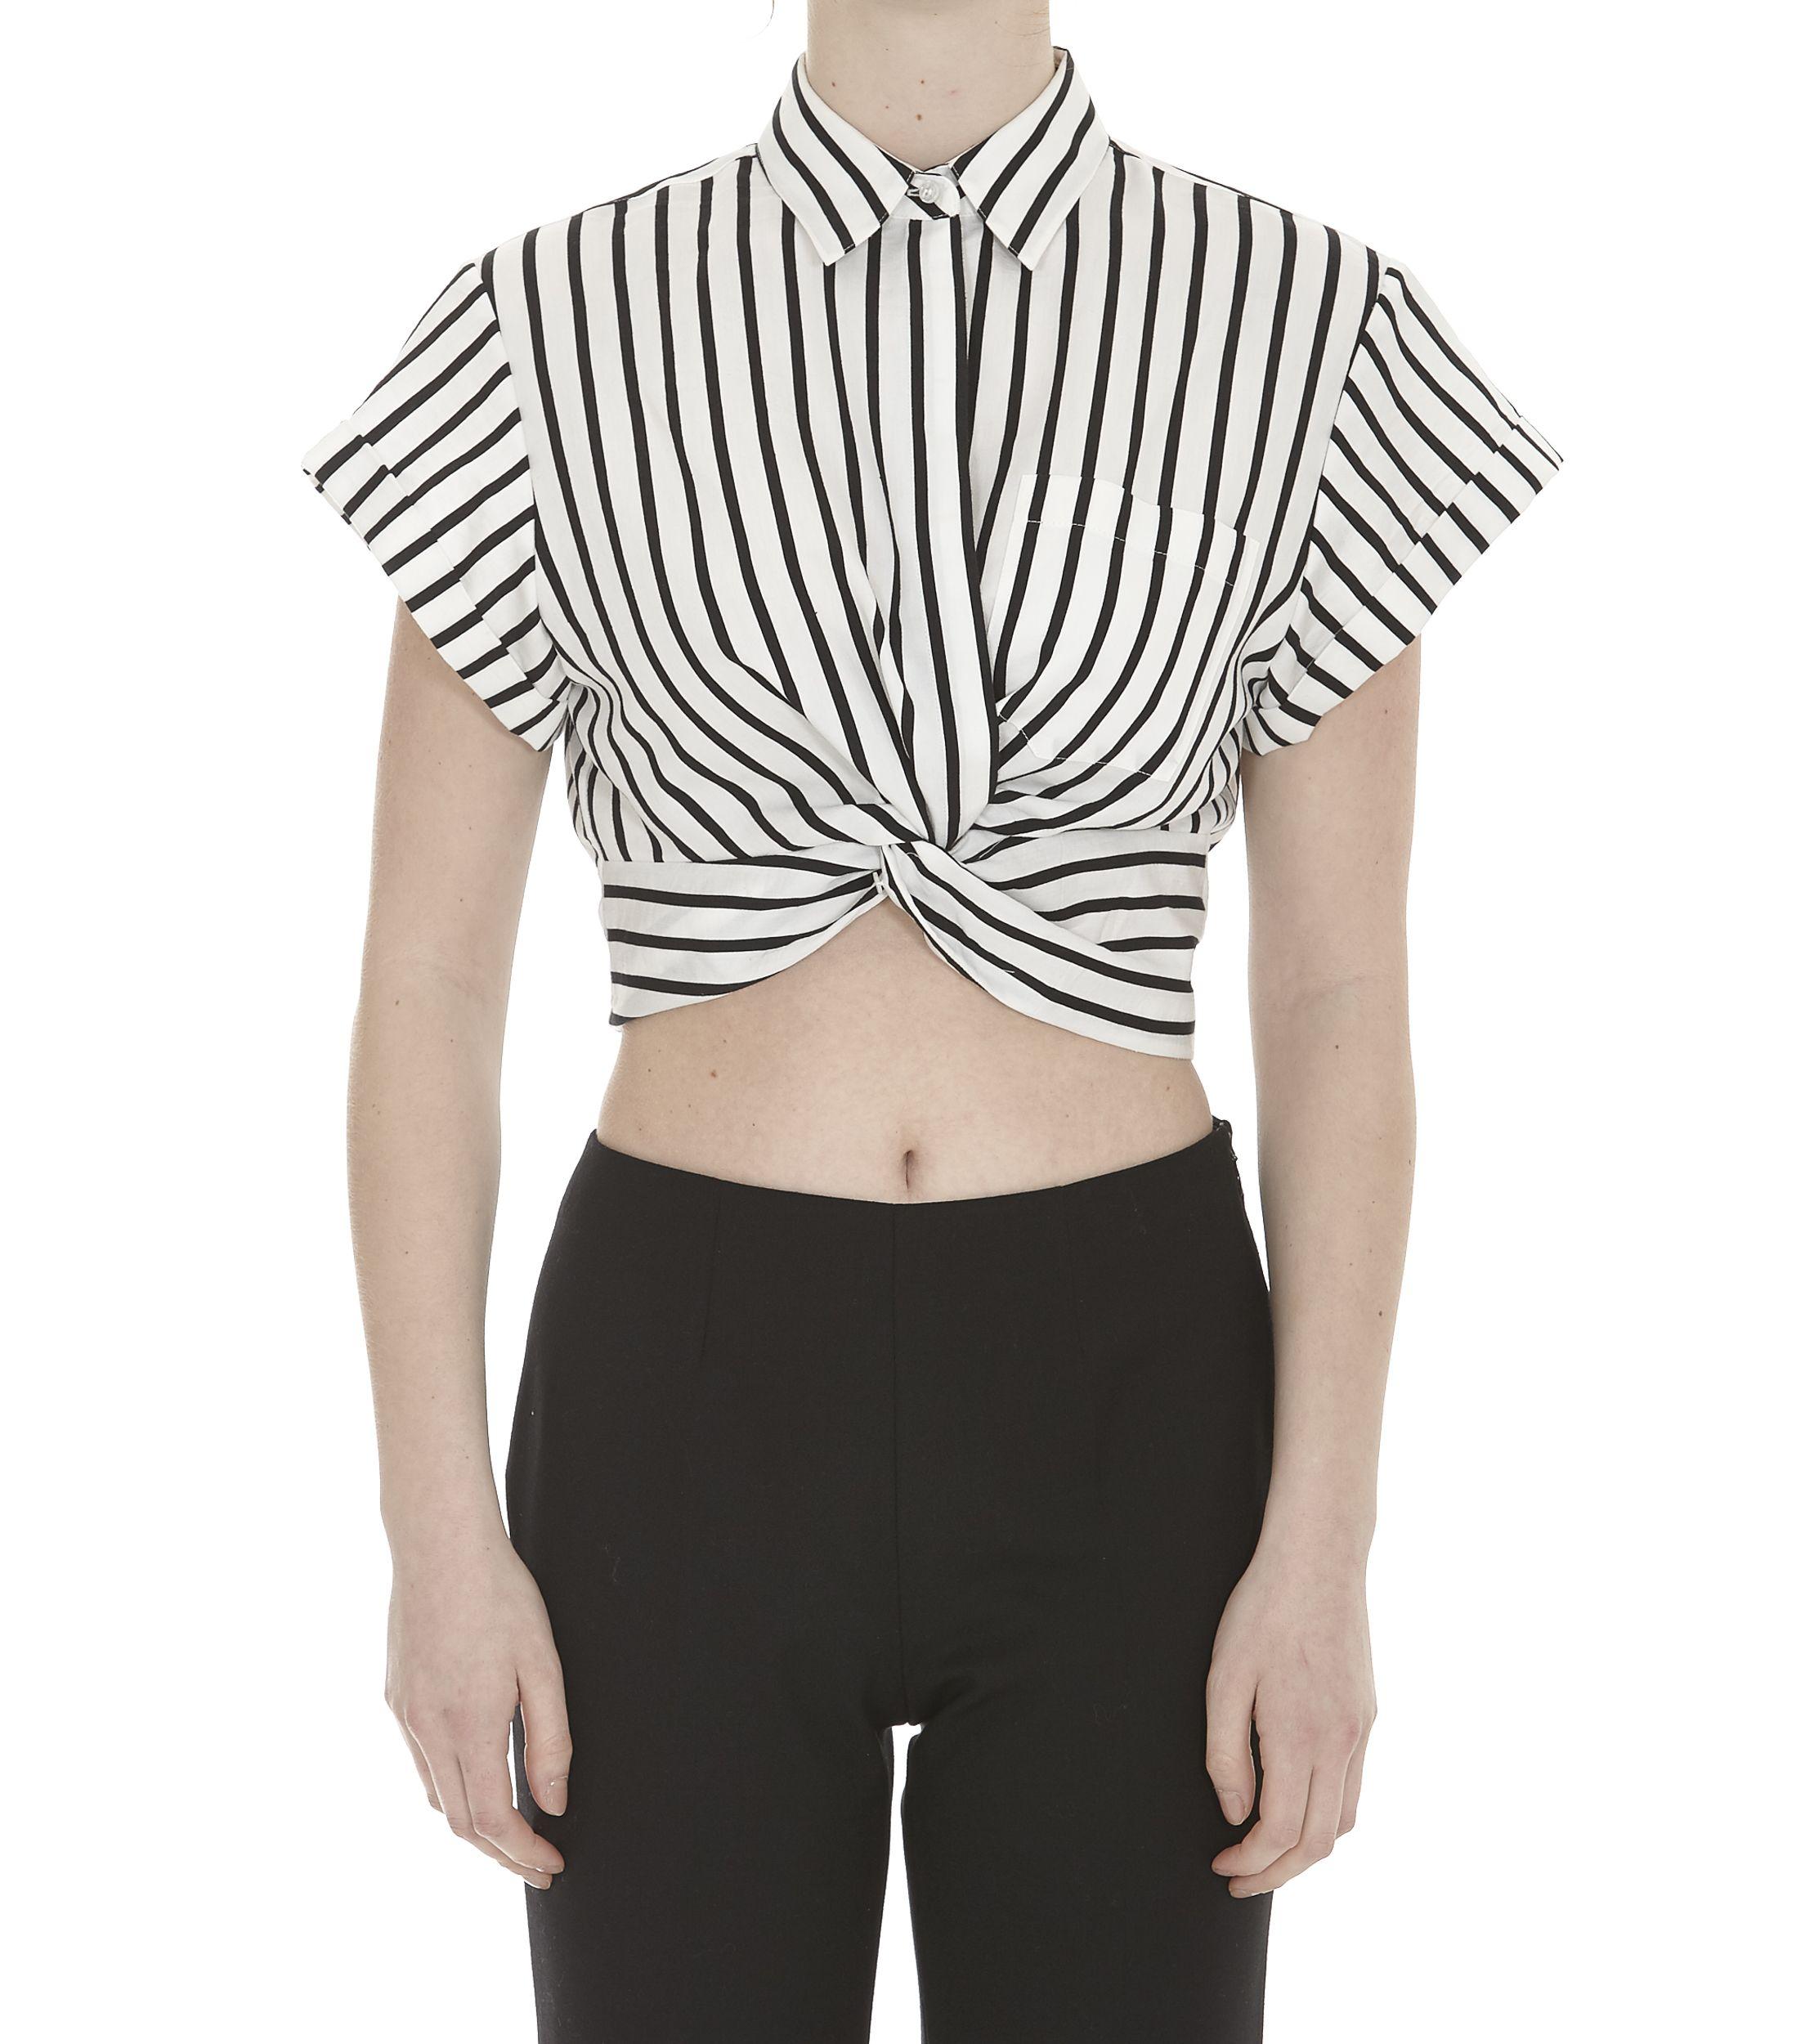 Alexander Wang Striped Twist Top